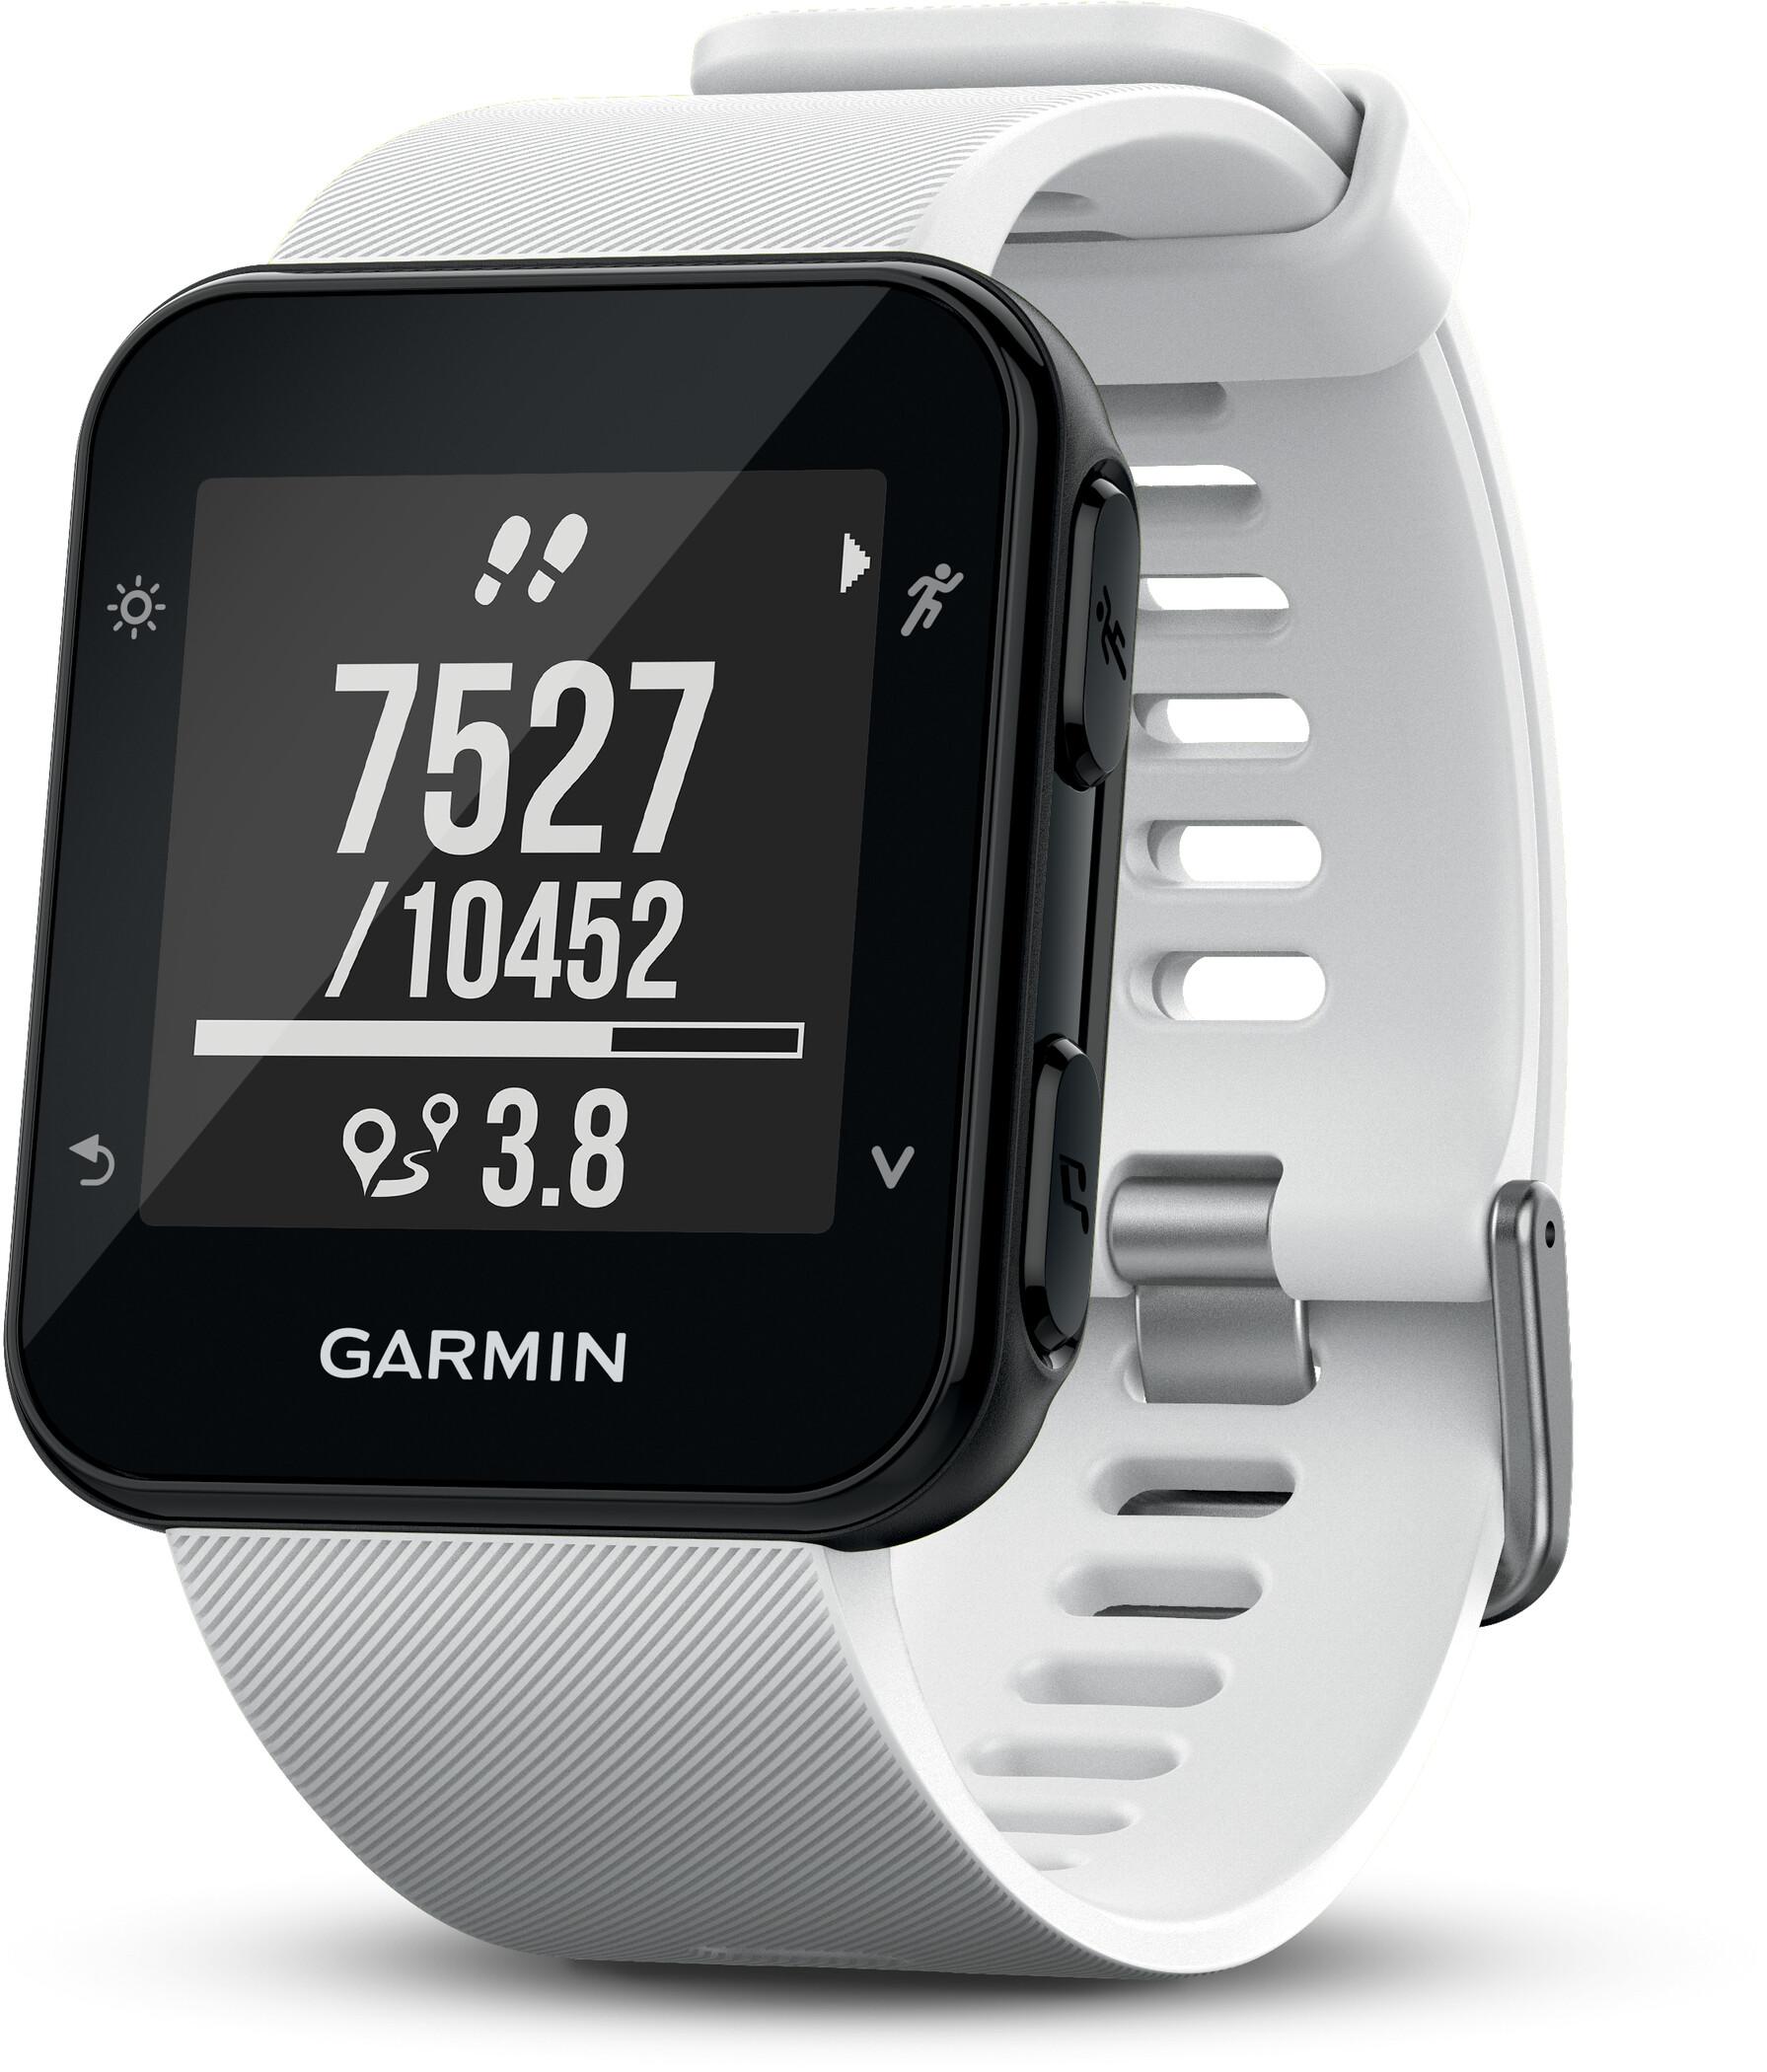 Garmin Forerunner 35 GPS-løbeur, white (2019) | Sports watches